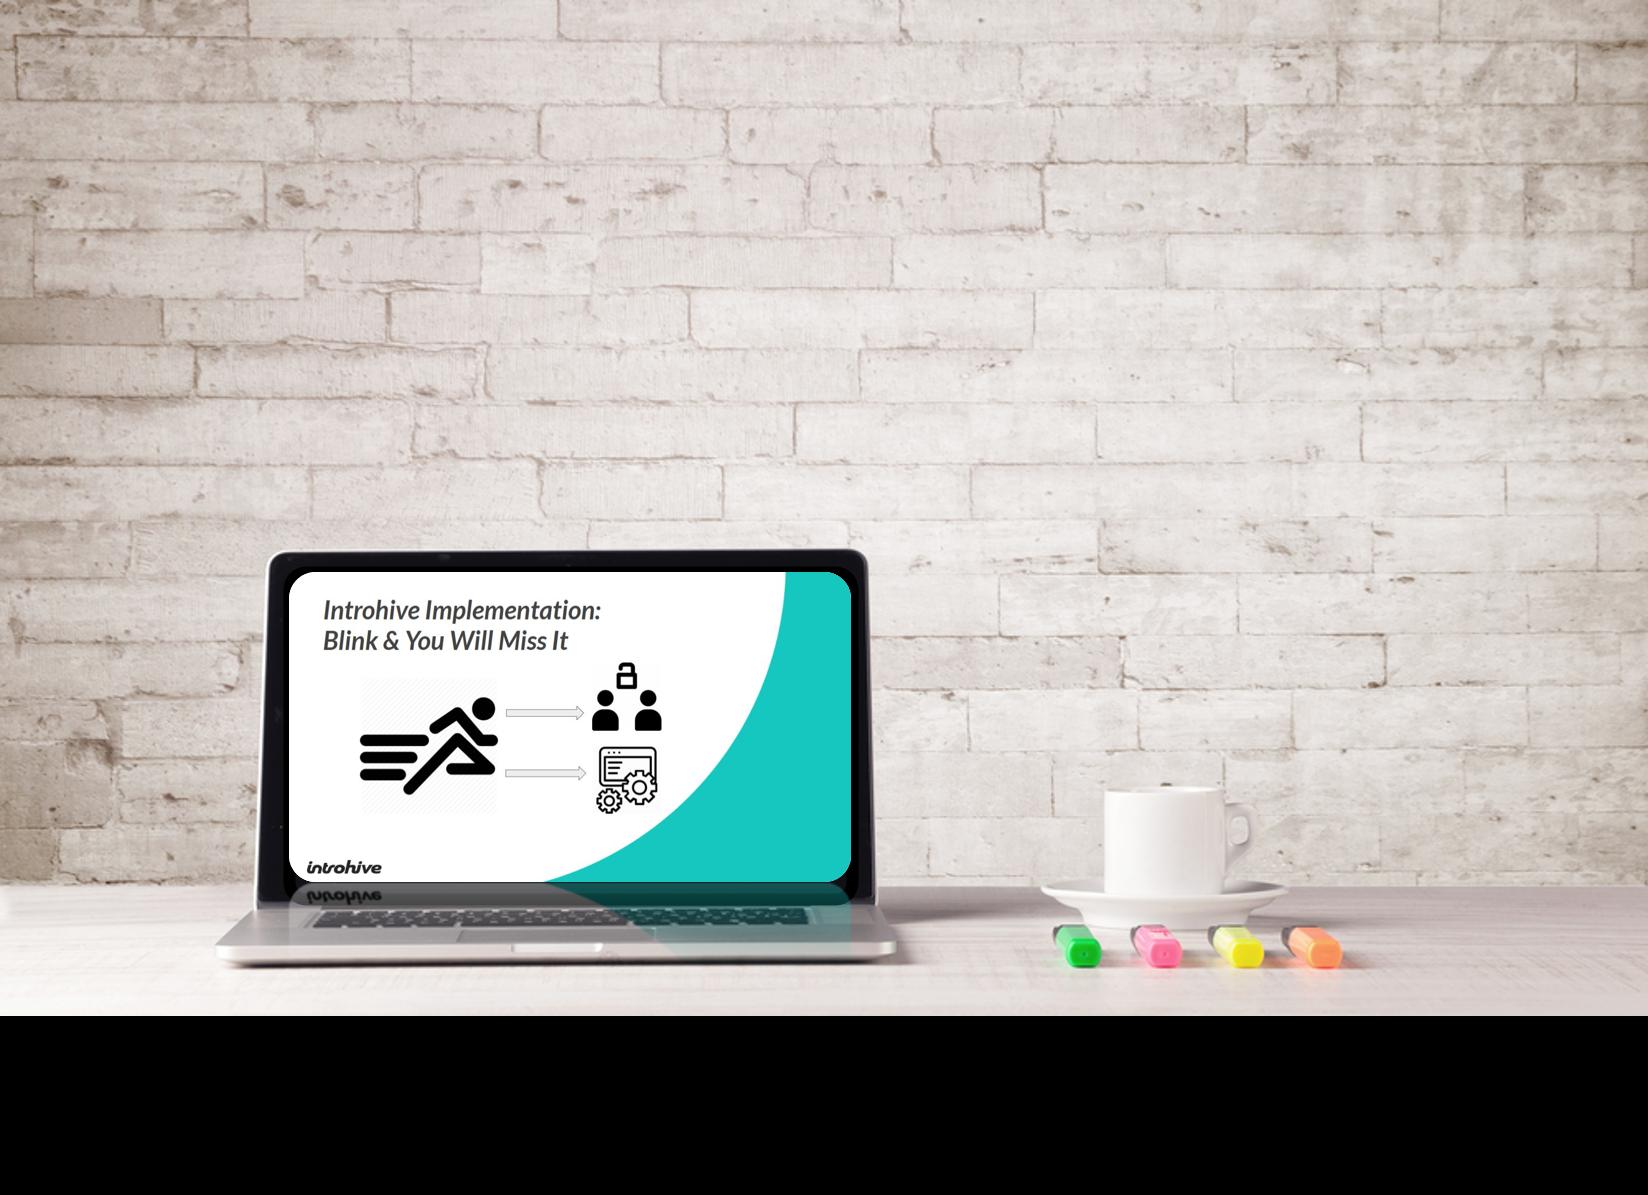 Implementation Webinar Laptop